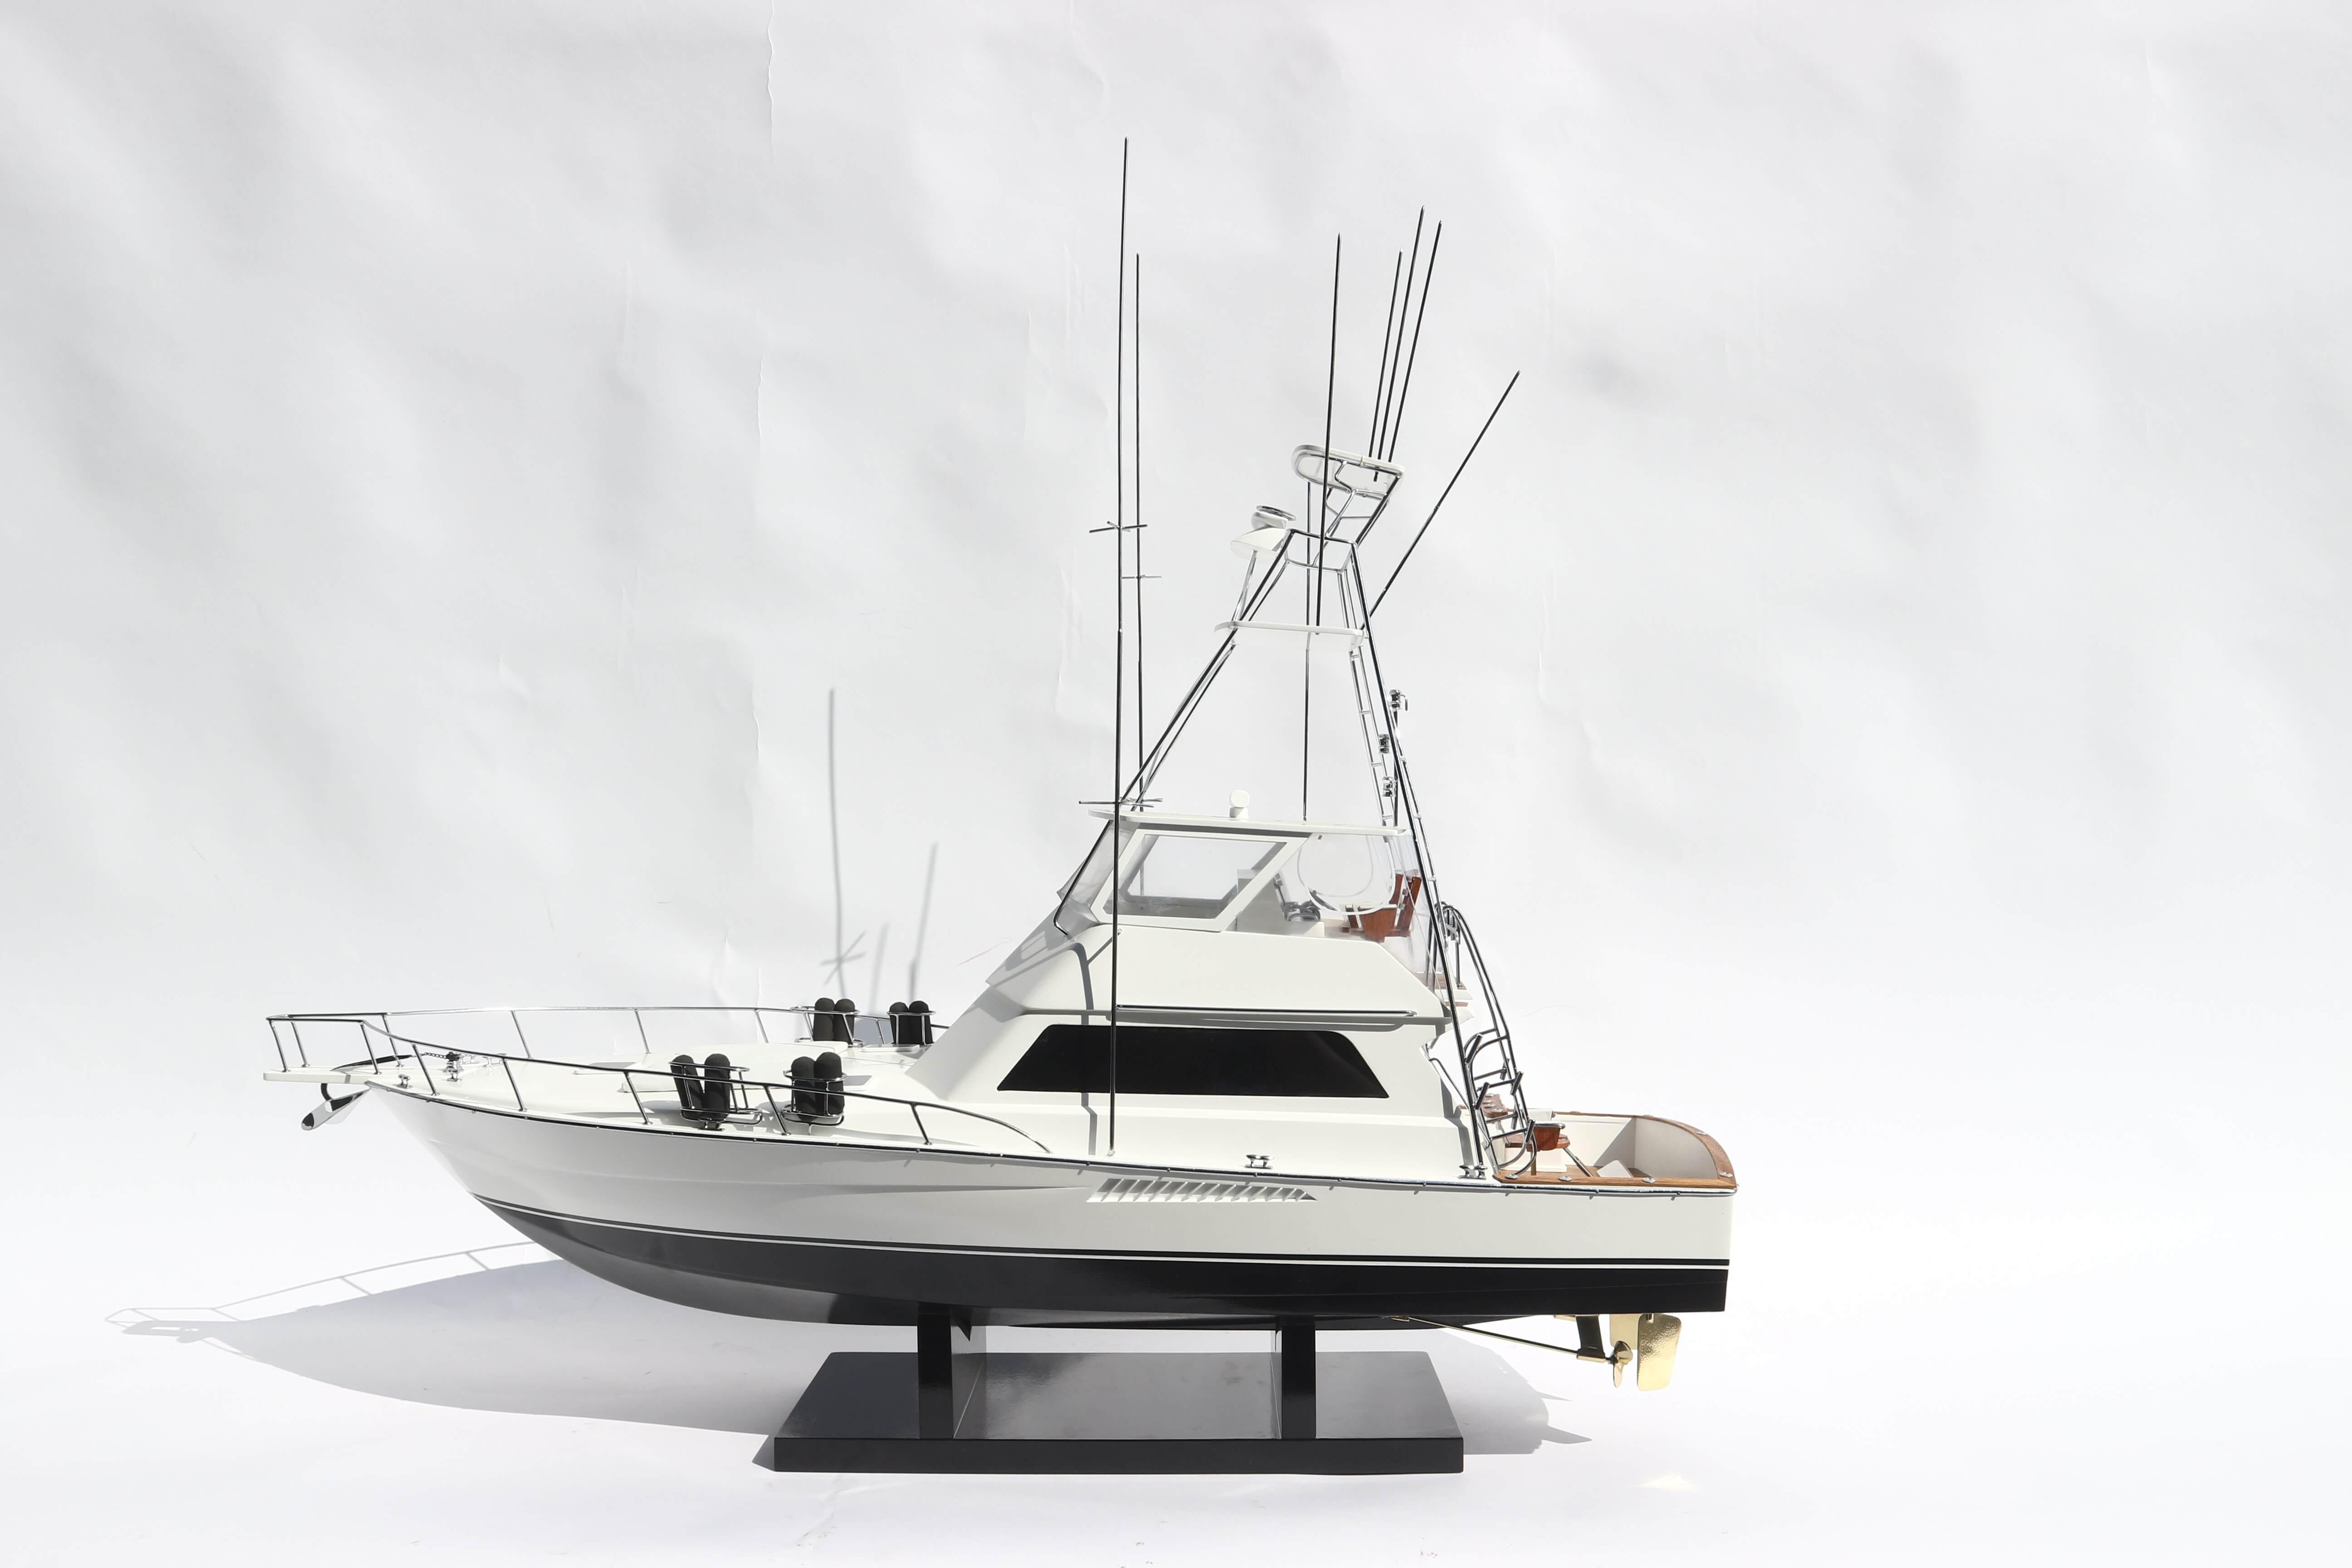 Viking 47 Model Ship - GN (CM0095P)